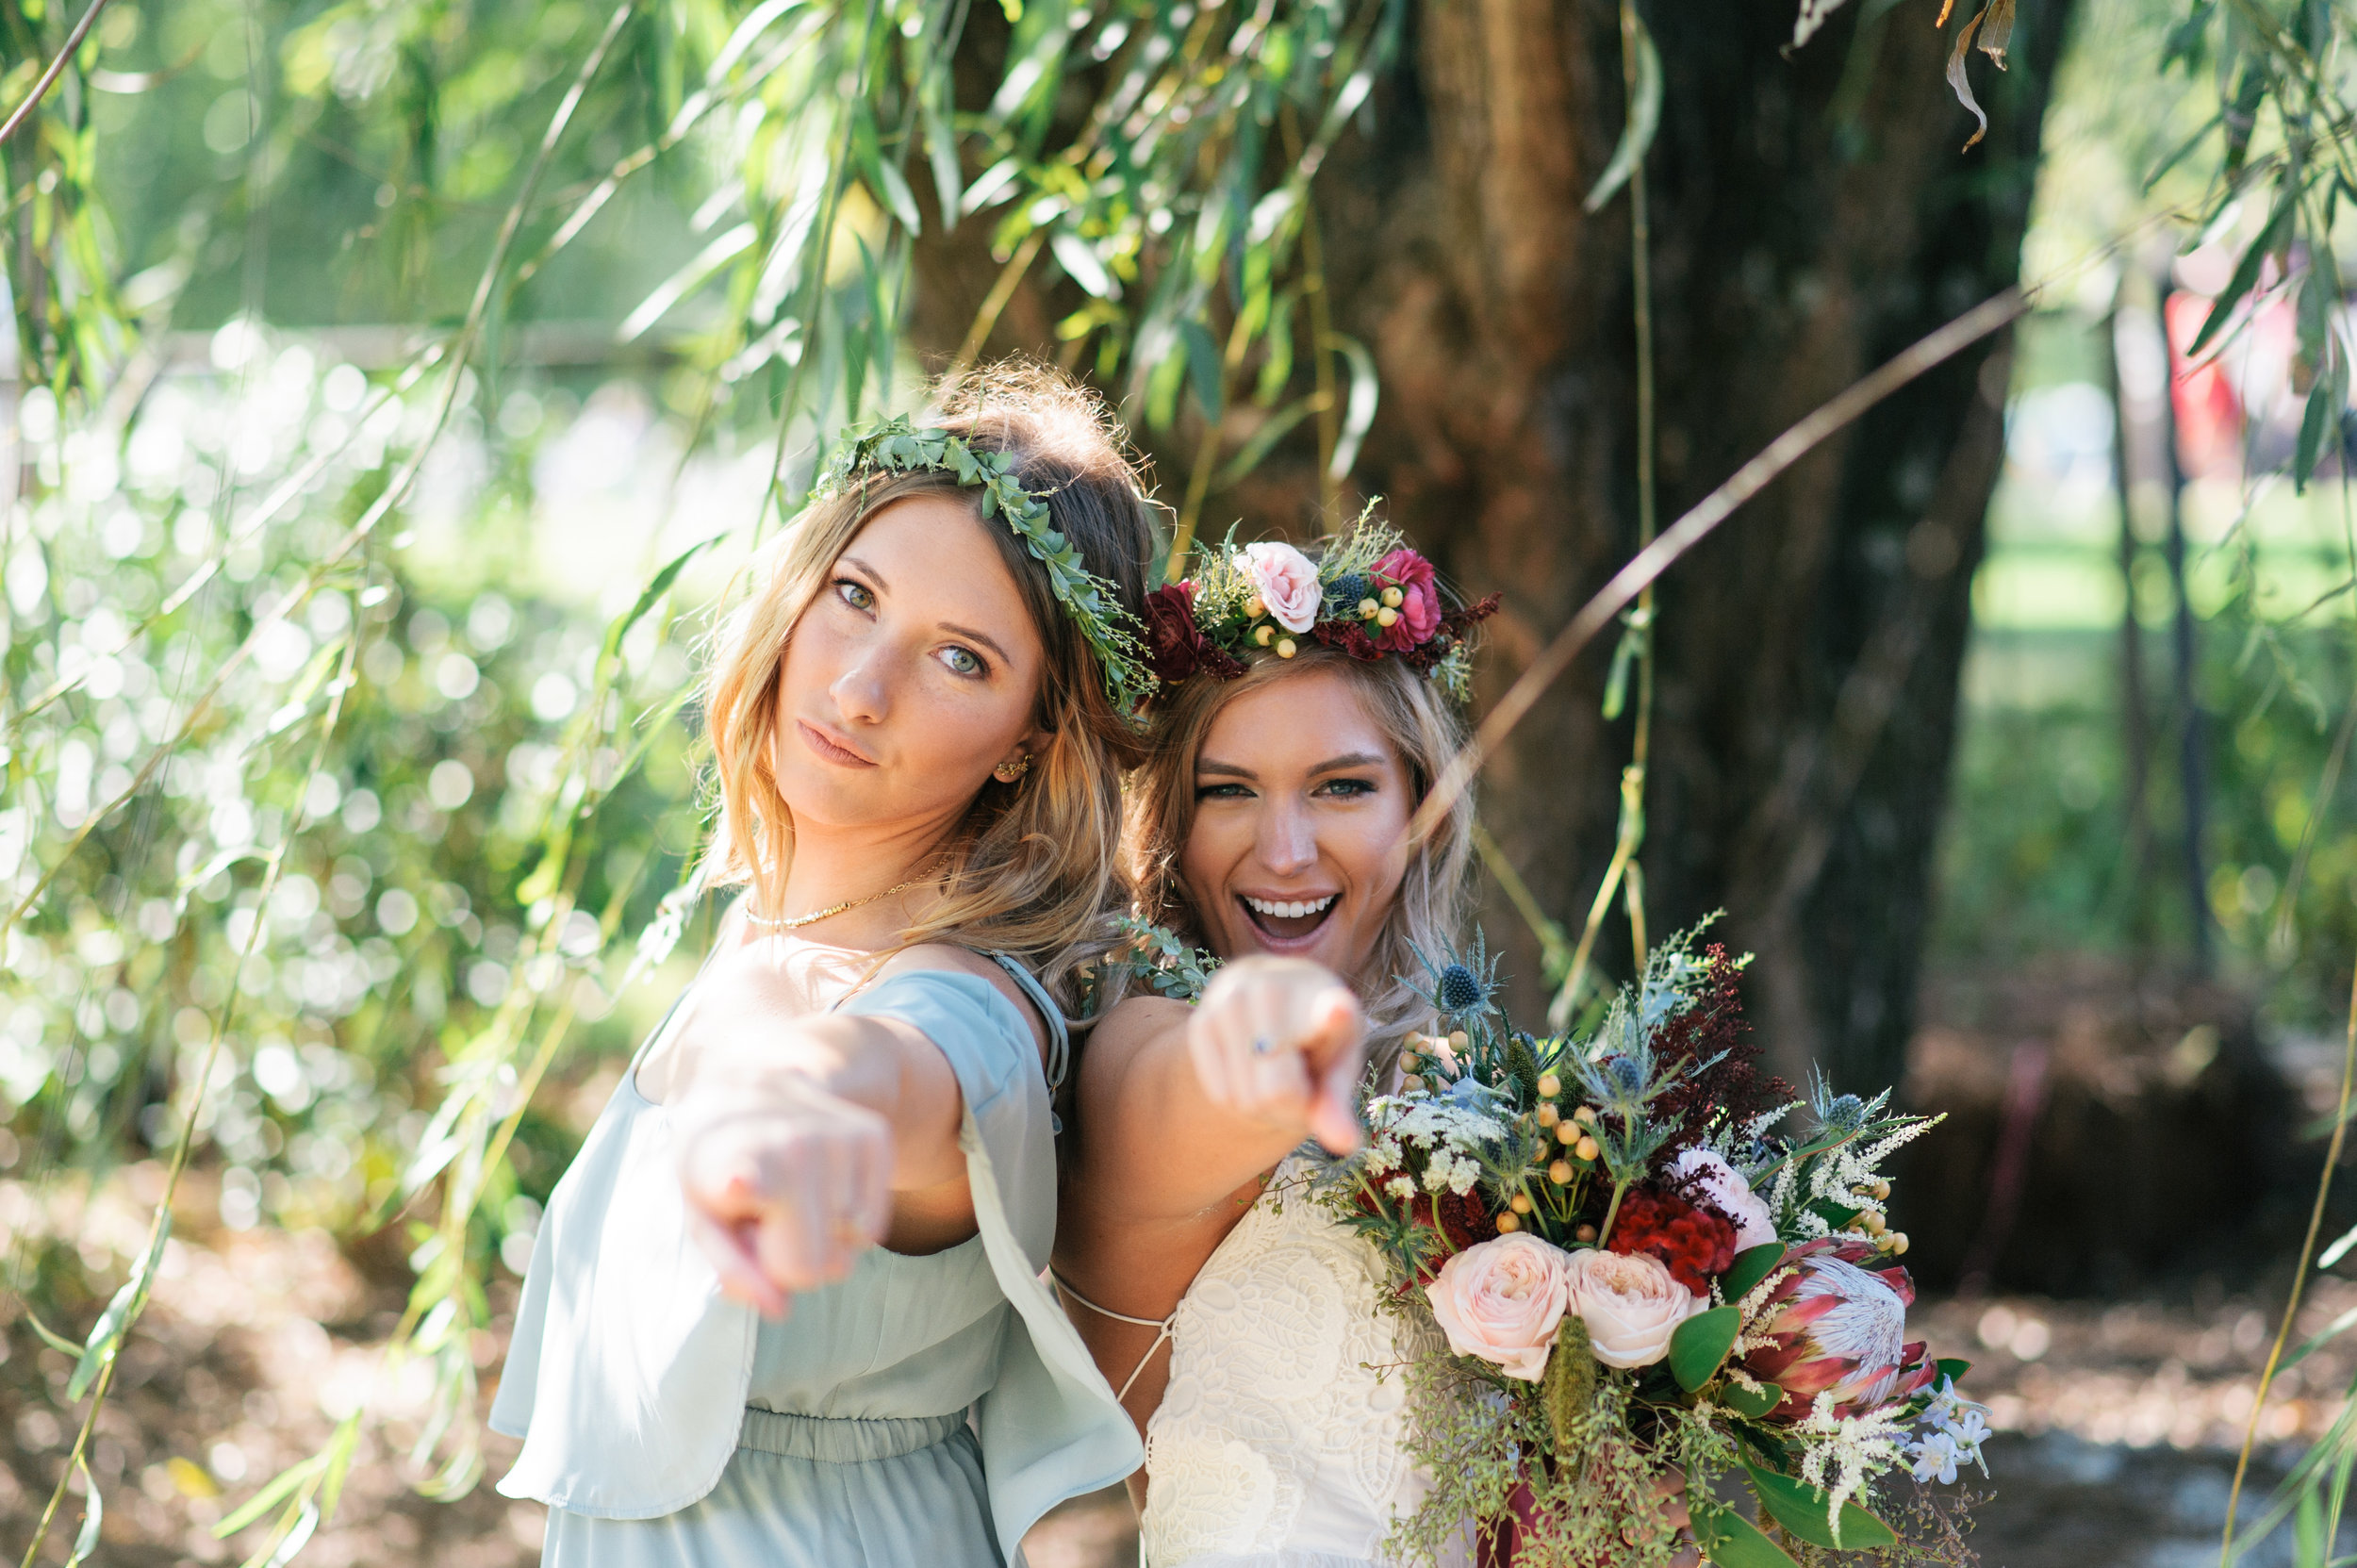 kristin-and-peter-atlanta-georgia-wedding-october-8th-2016 (83 of 1068).jpg